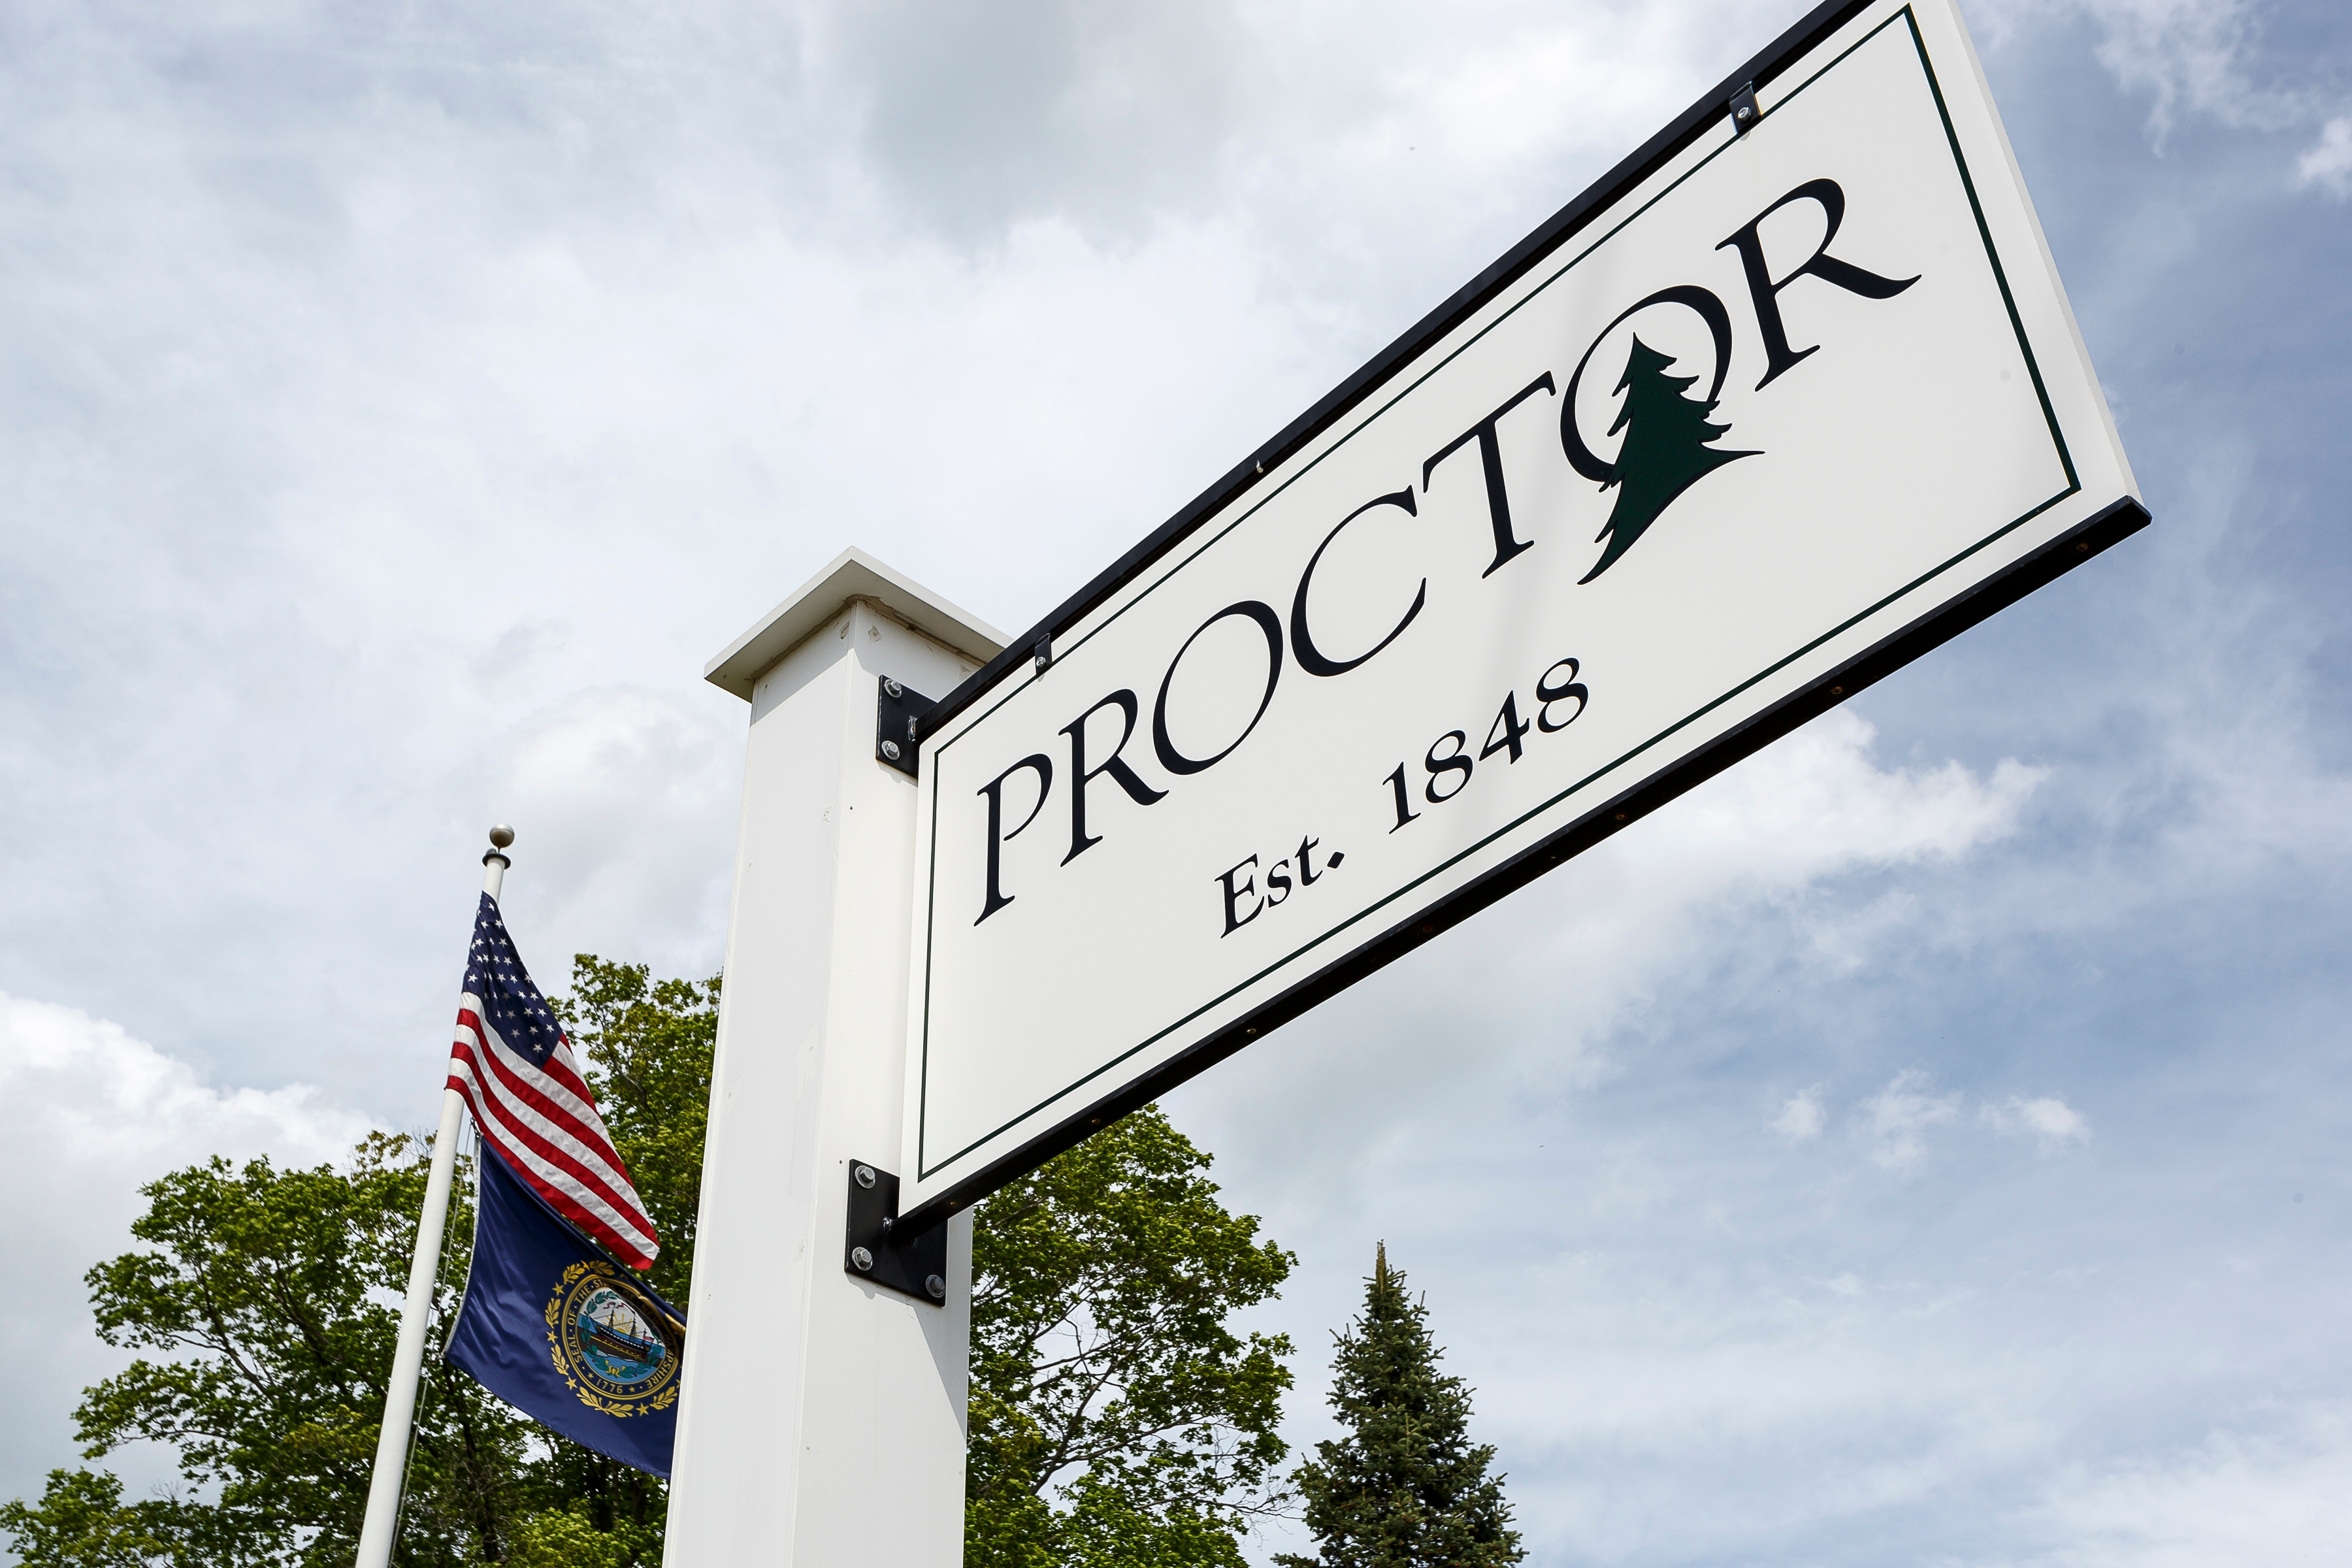 Proctor Academy history